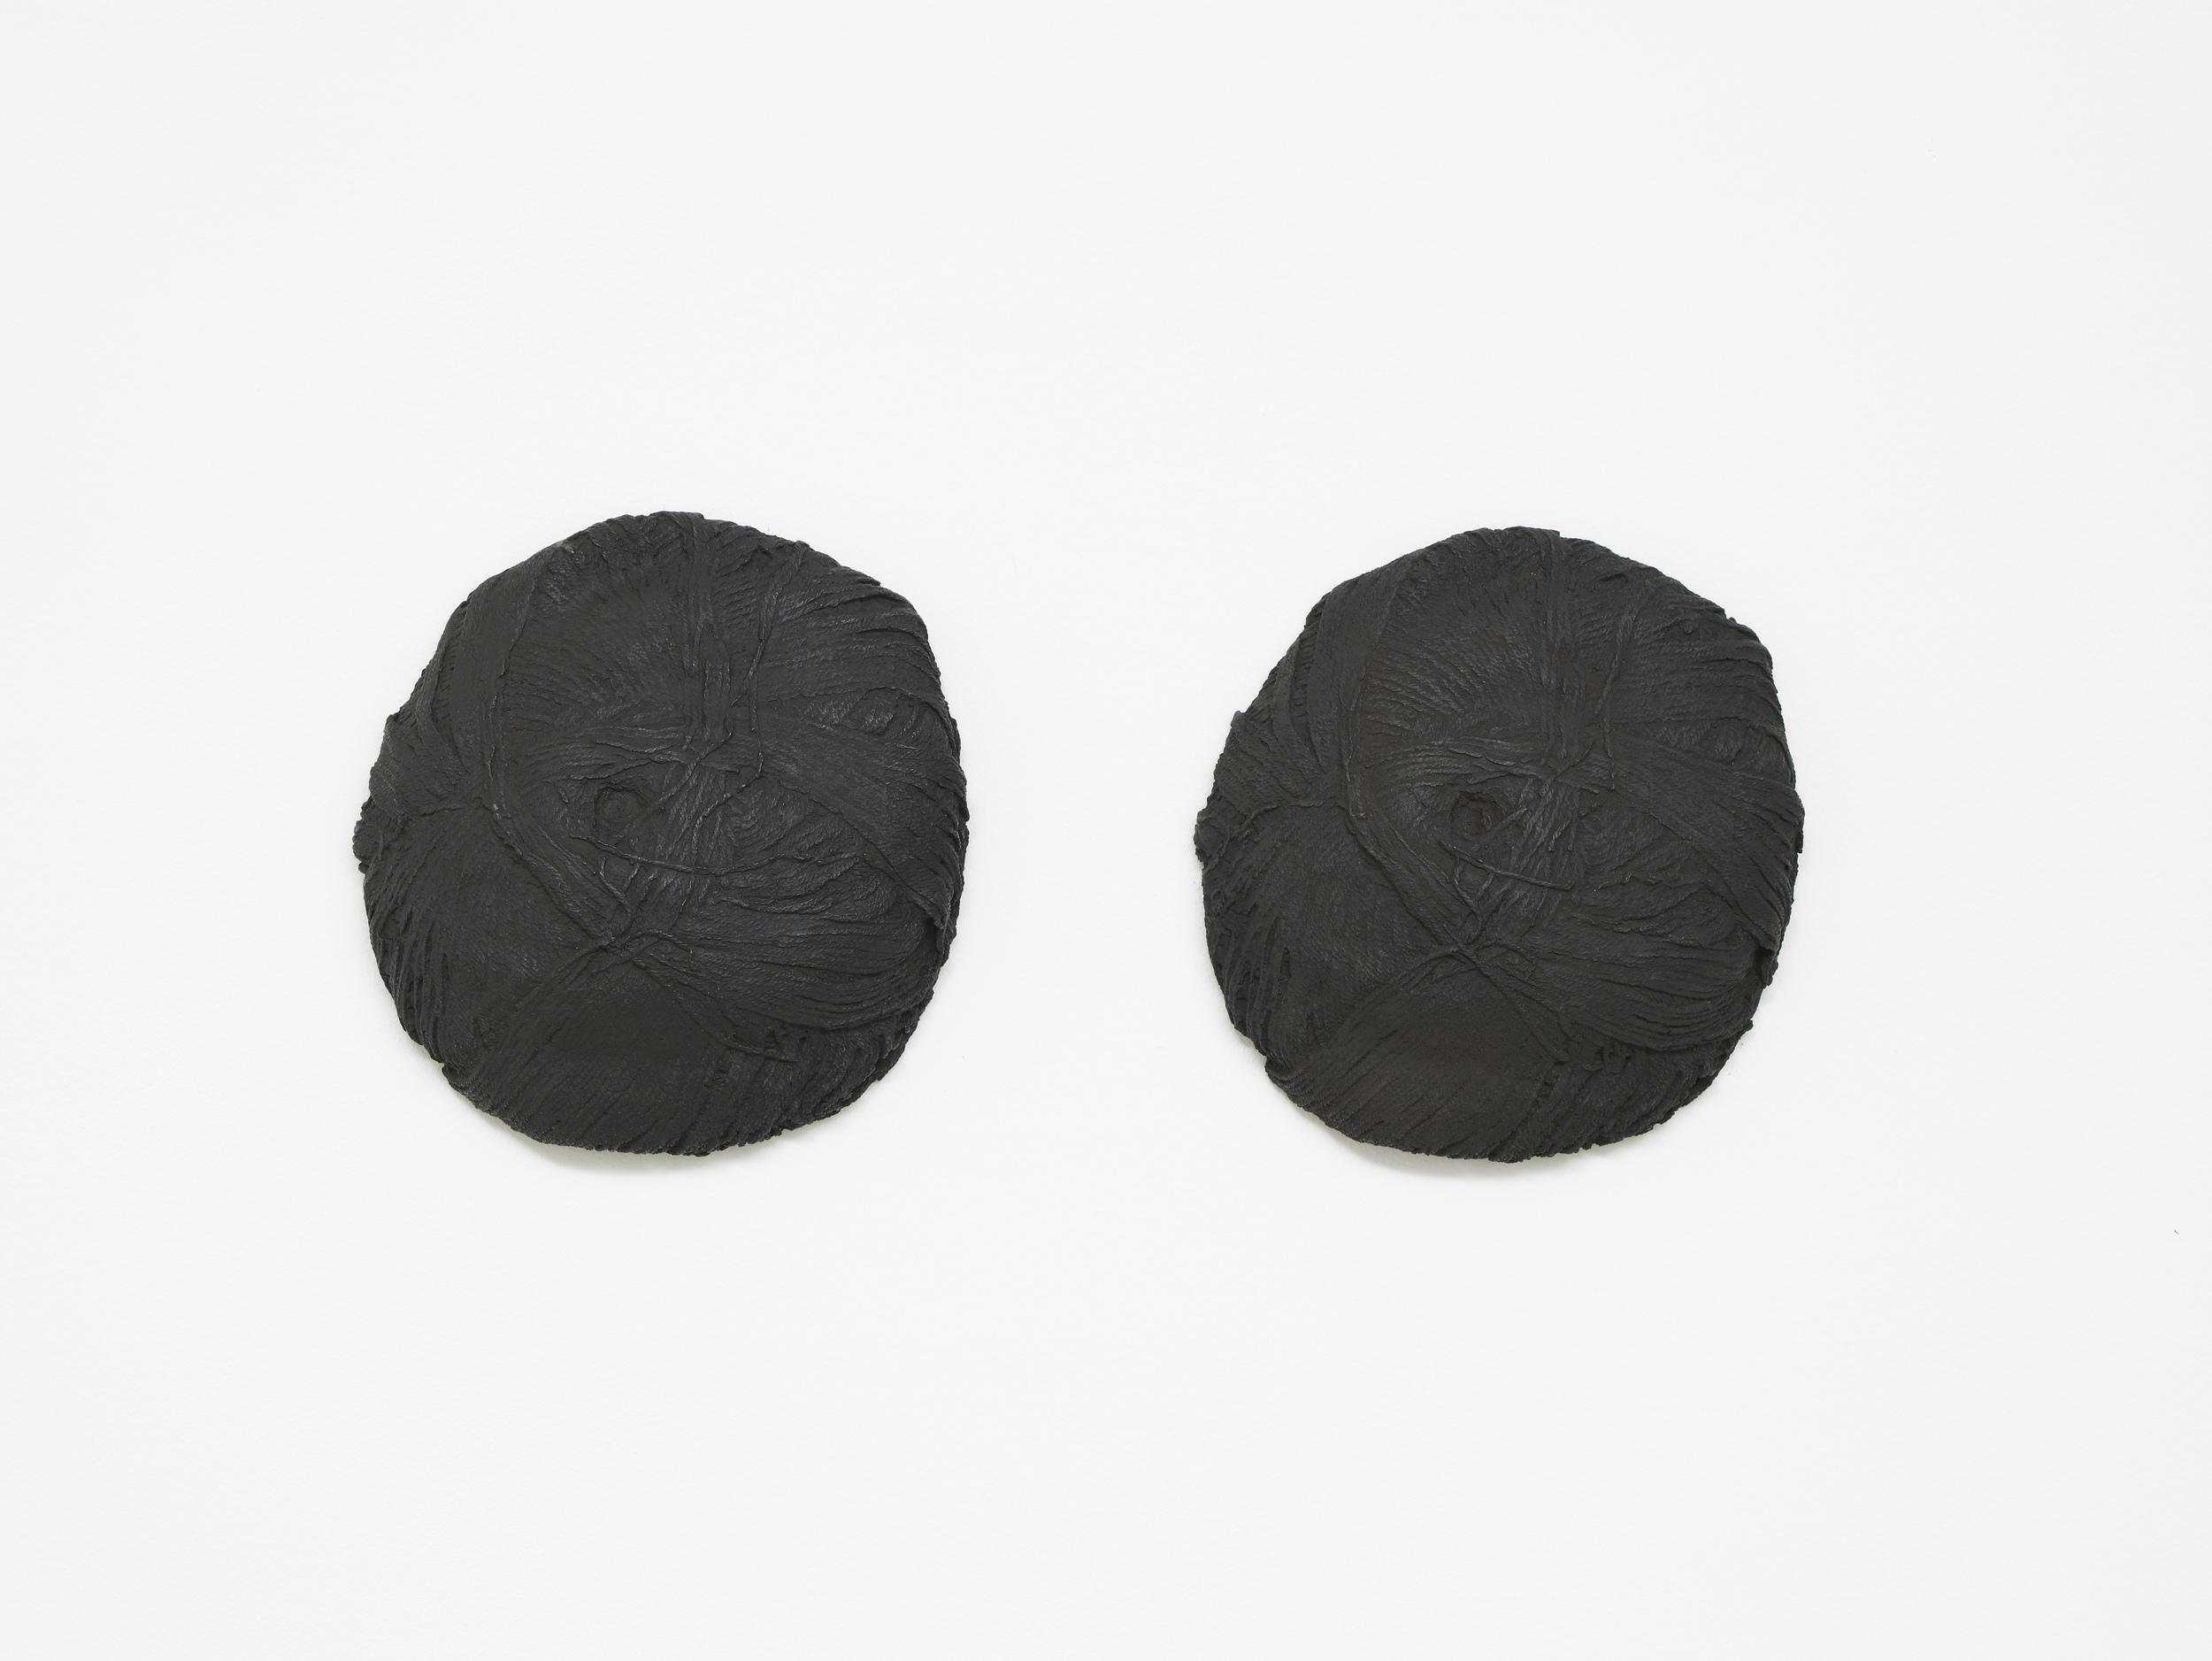 Twins   2012   Bronze   2 parts, each part: 25 x 24 x 6 cm / 9.8 x 9.4 x 2.4 in